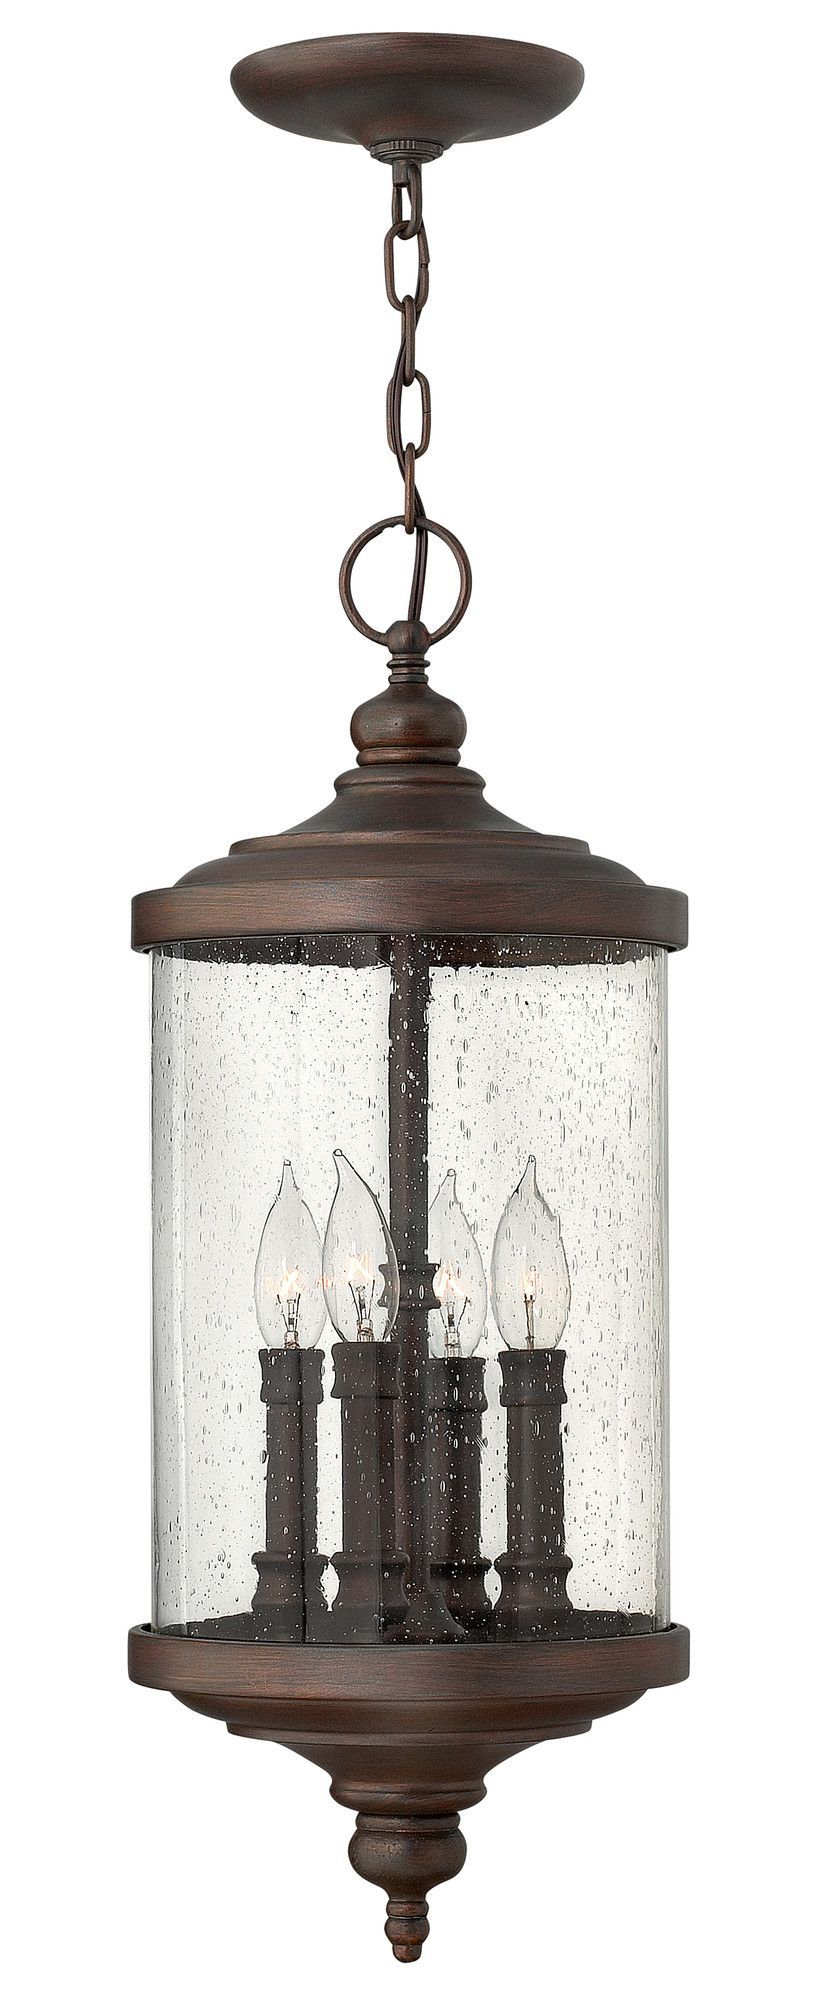 Barrington 4 light outdoor hanging lantern